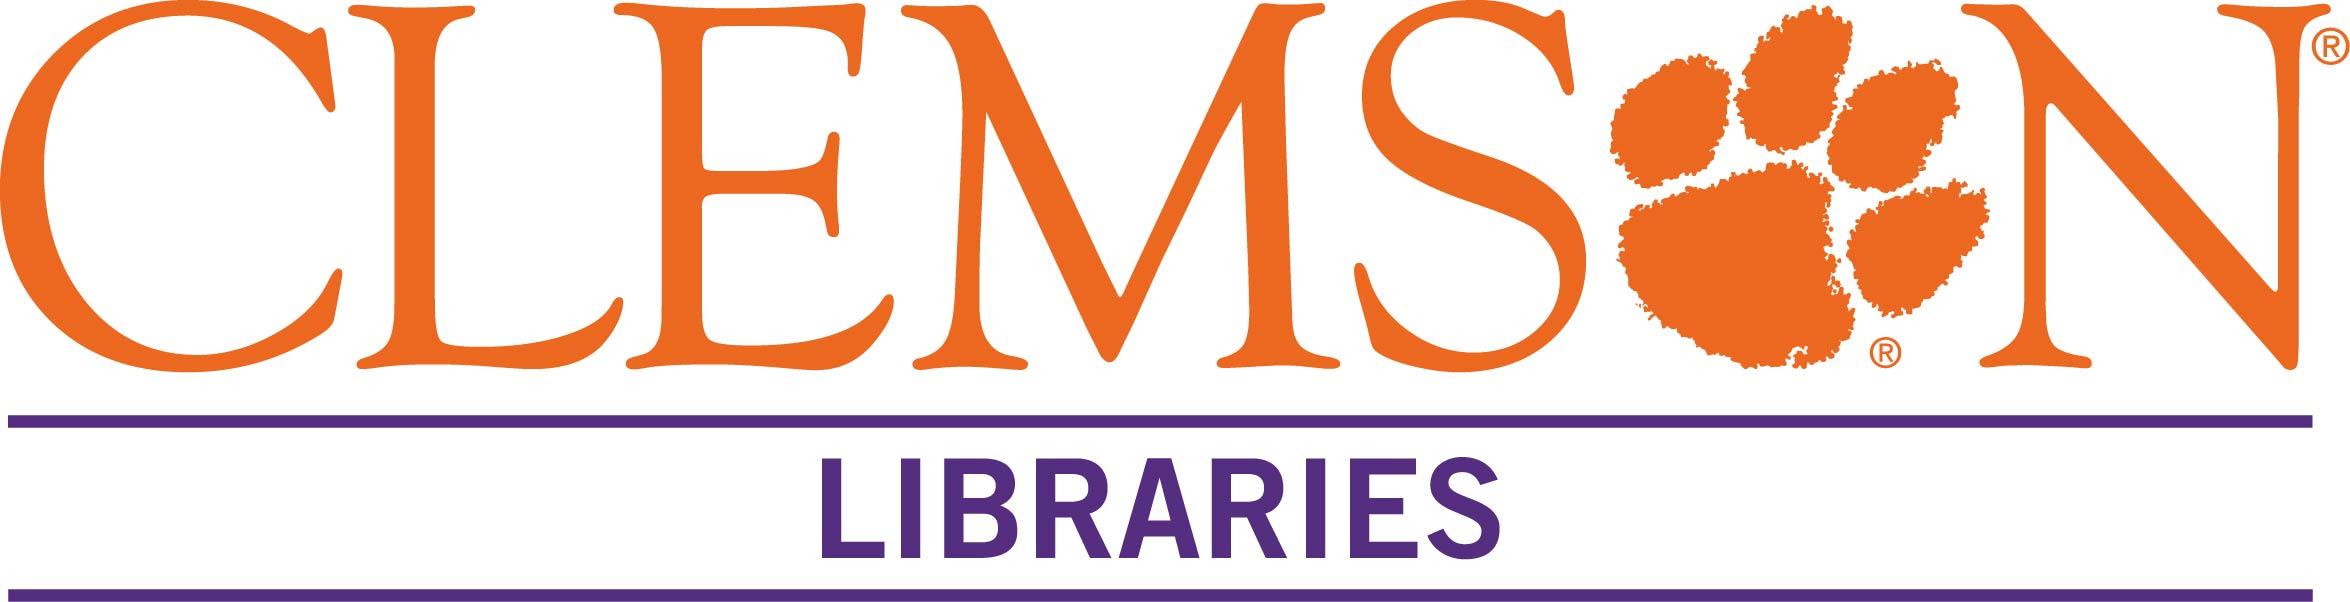 Clemson Library Wordmark